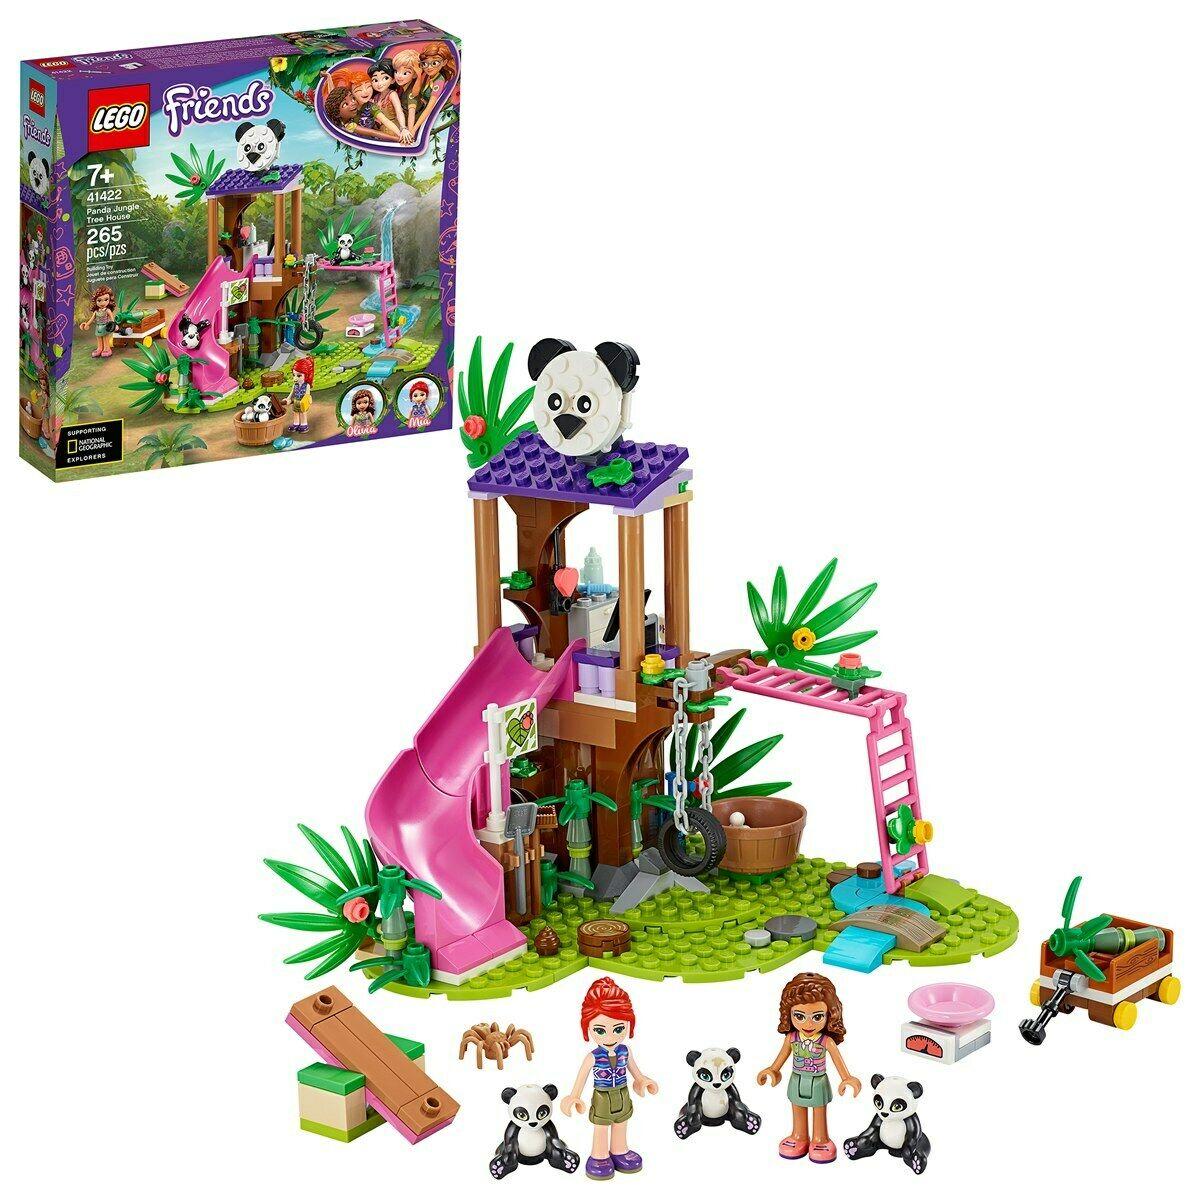 Lego Friends Panda Jungle Tree House - Lego 41422